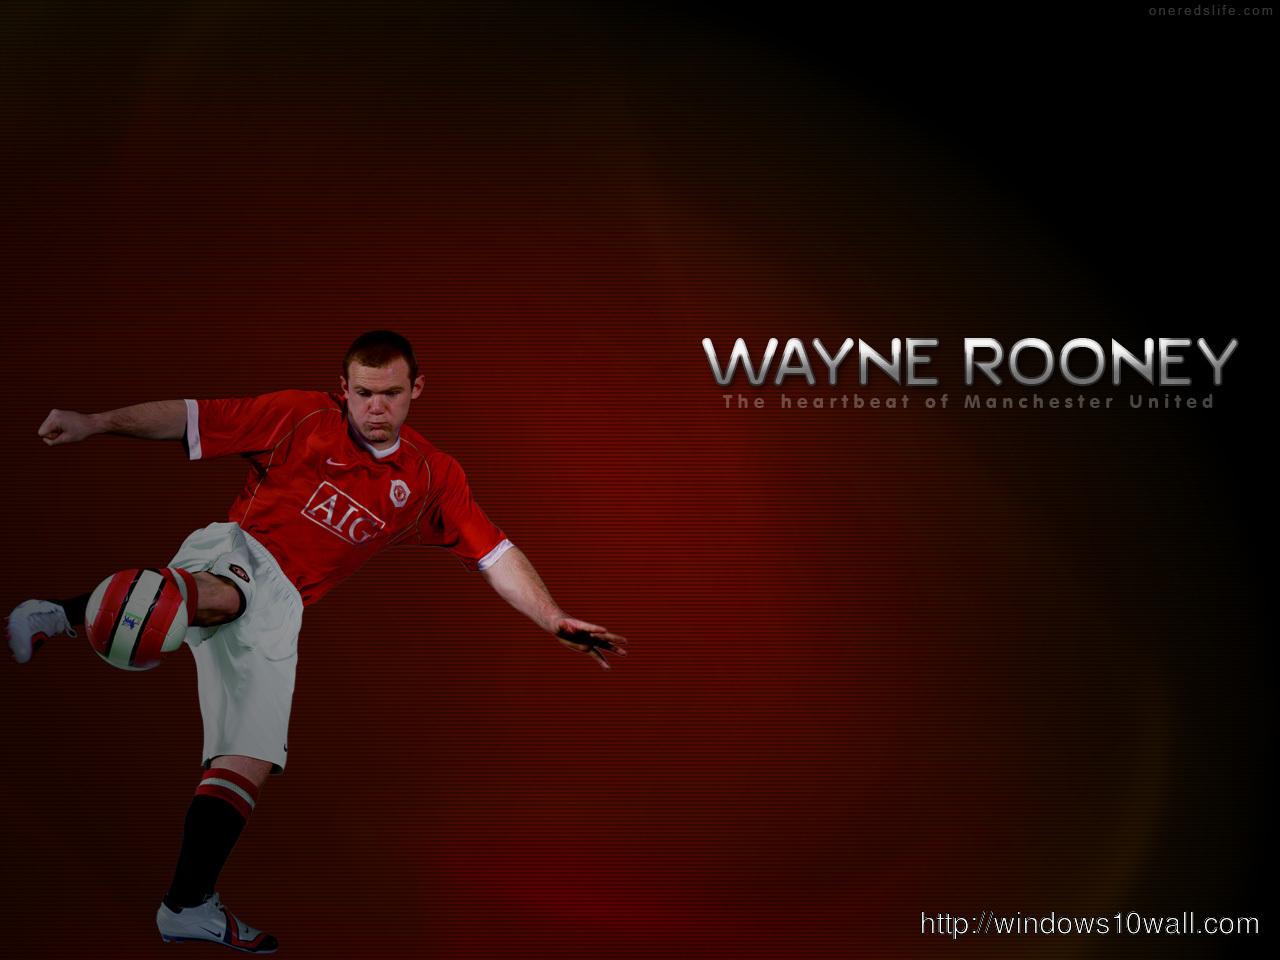 Wayne Rooney World Cup Wallpaper